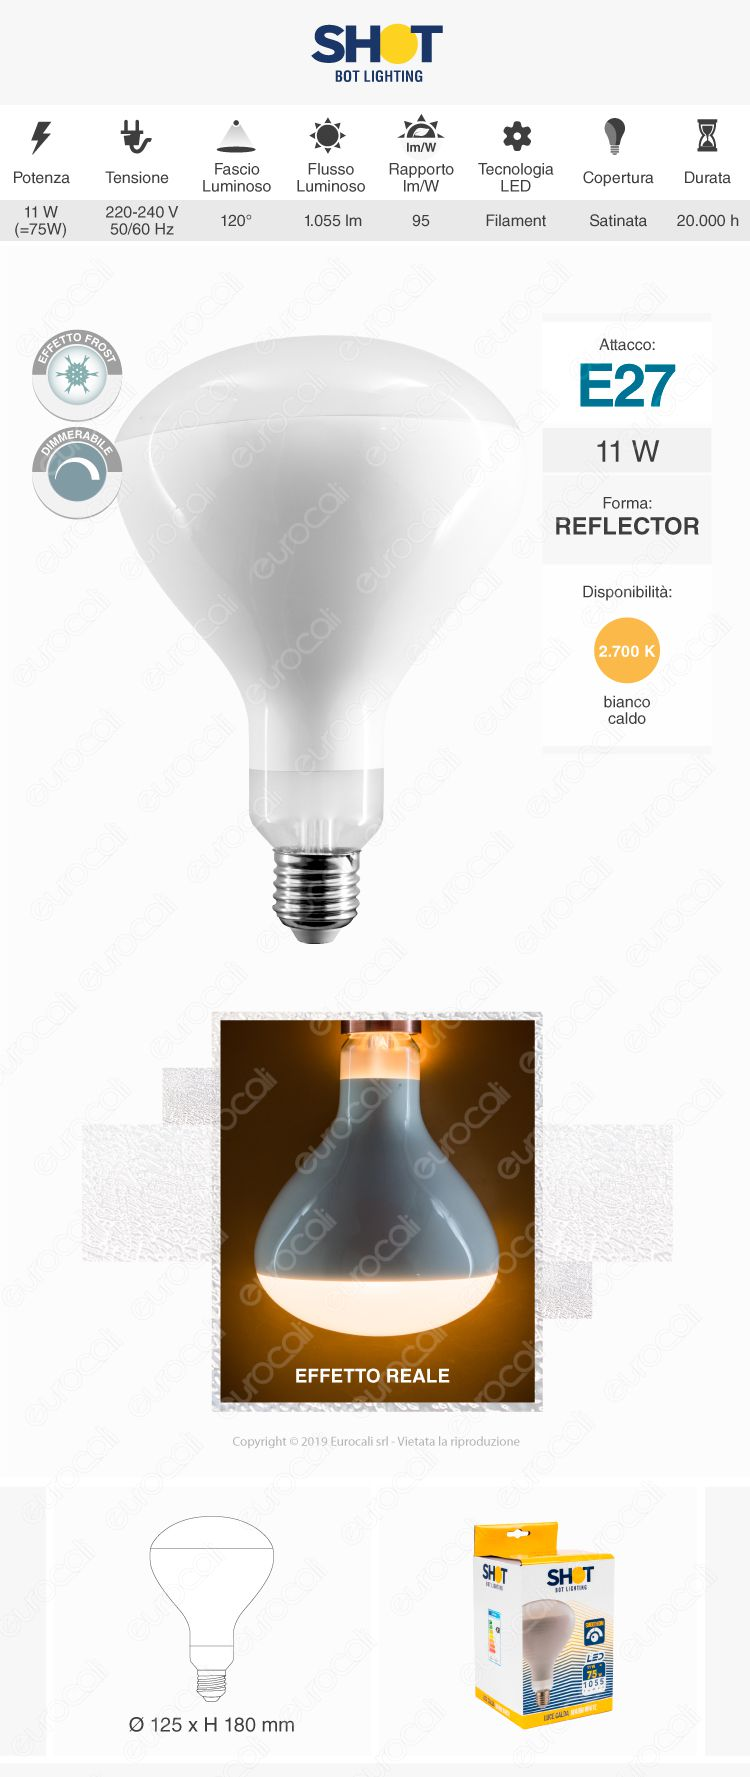 Bot Lighting Shot Lampadina LED E27 11W Bulb Reflector R125 Dimmerabile